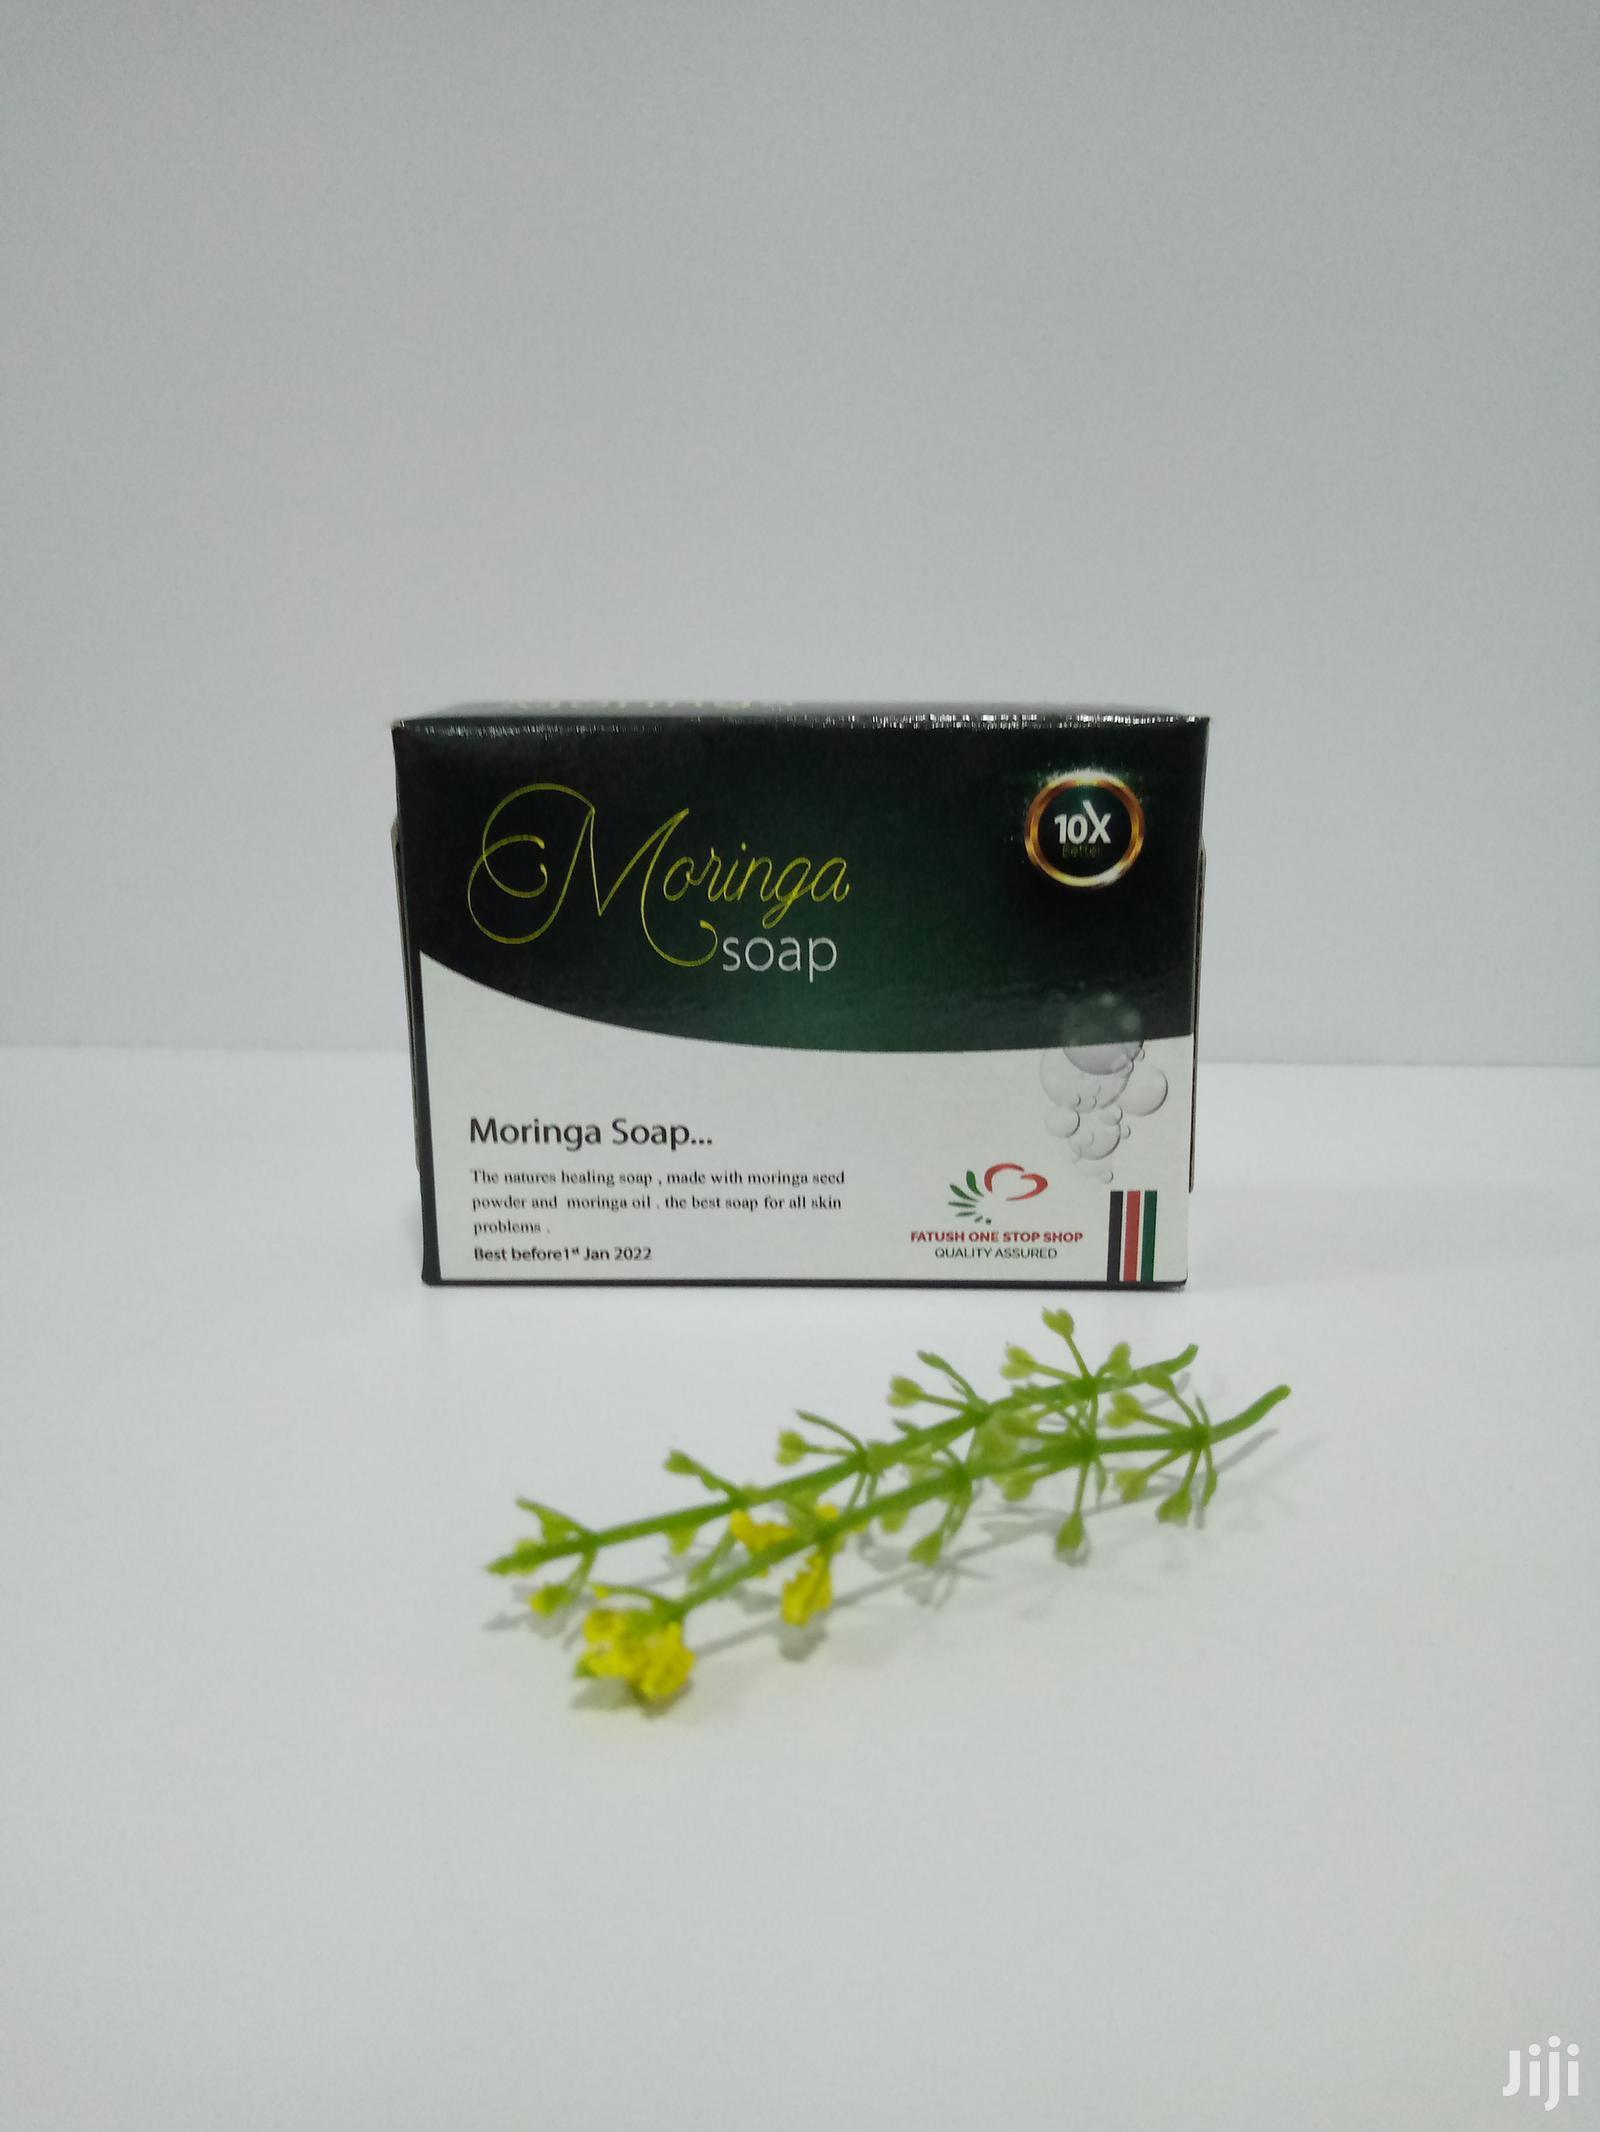 Archive: Moringa Soap